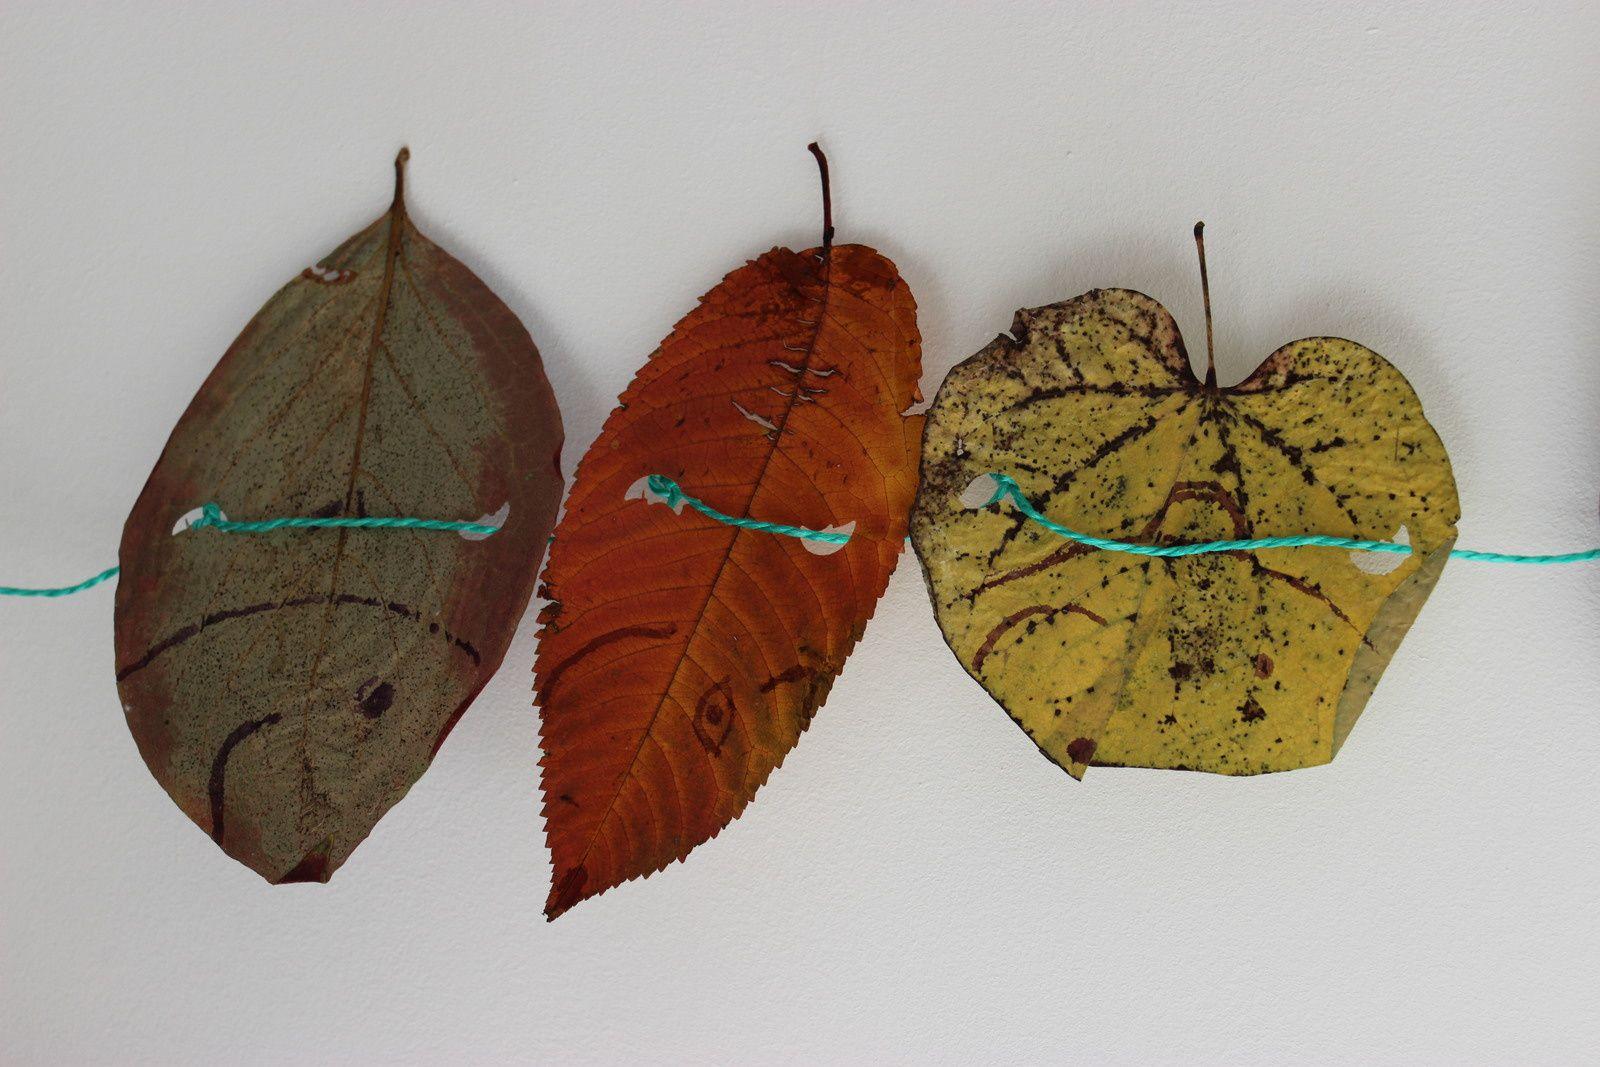 Guirlande de feuiles d'automne